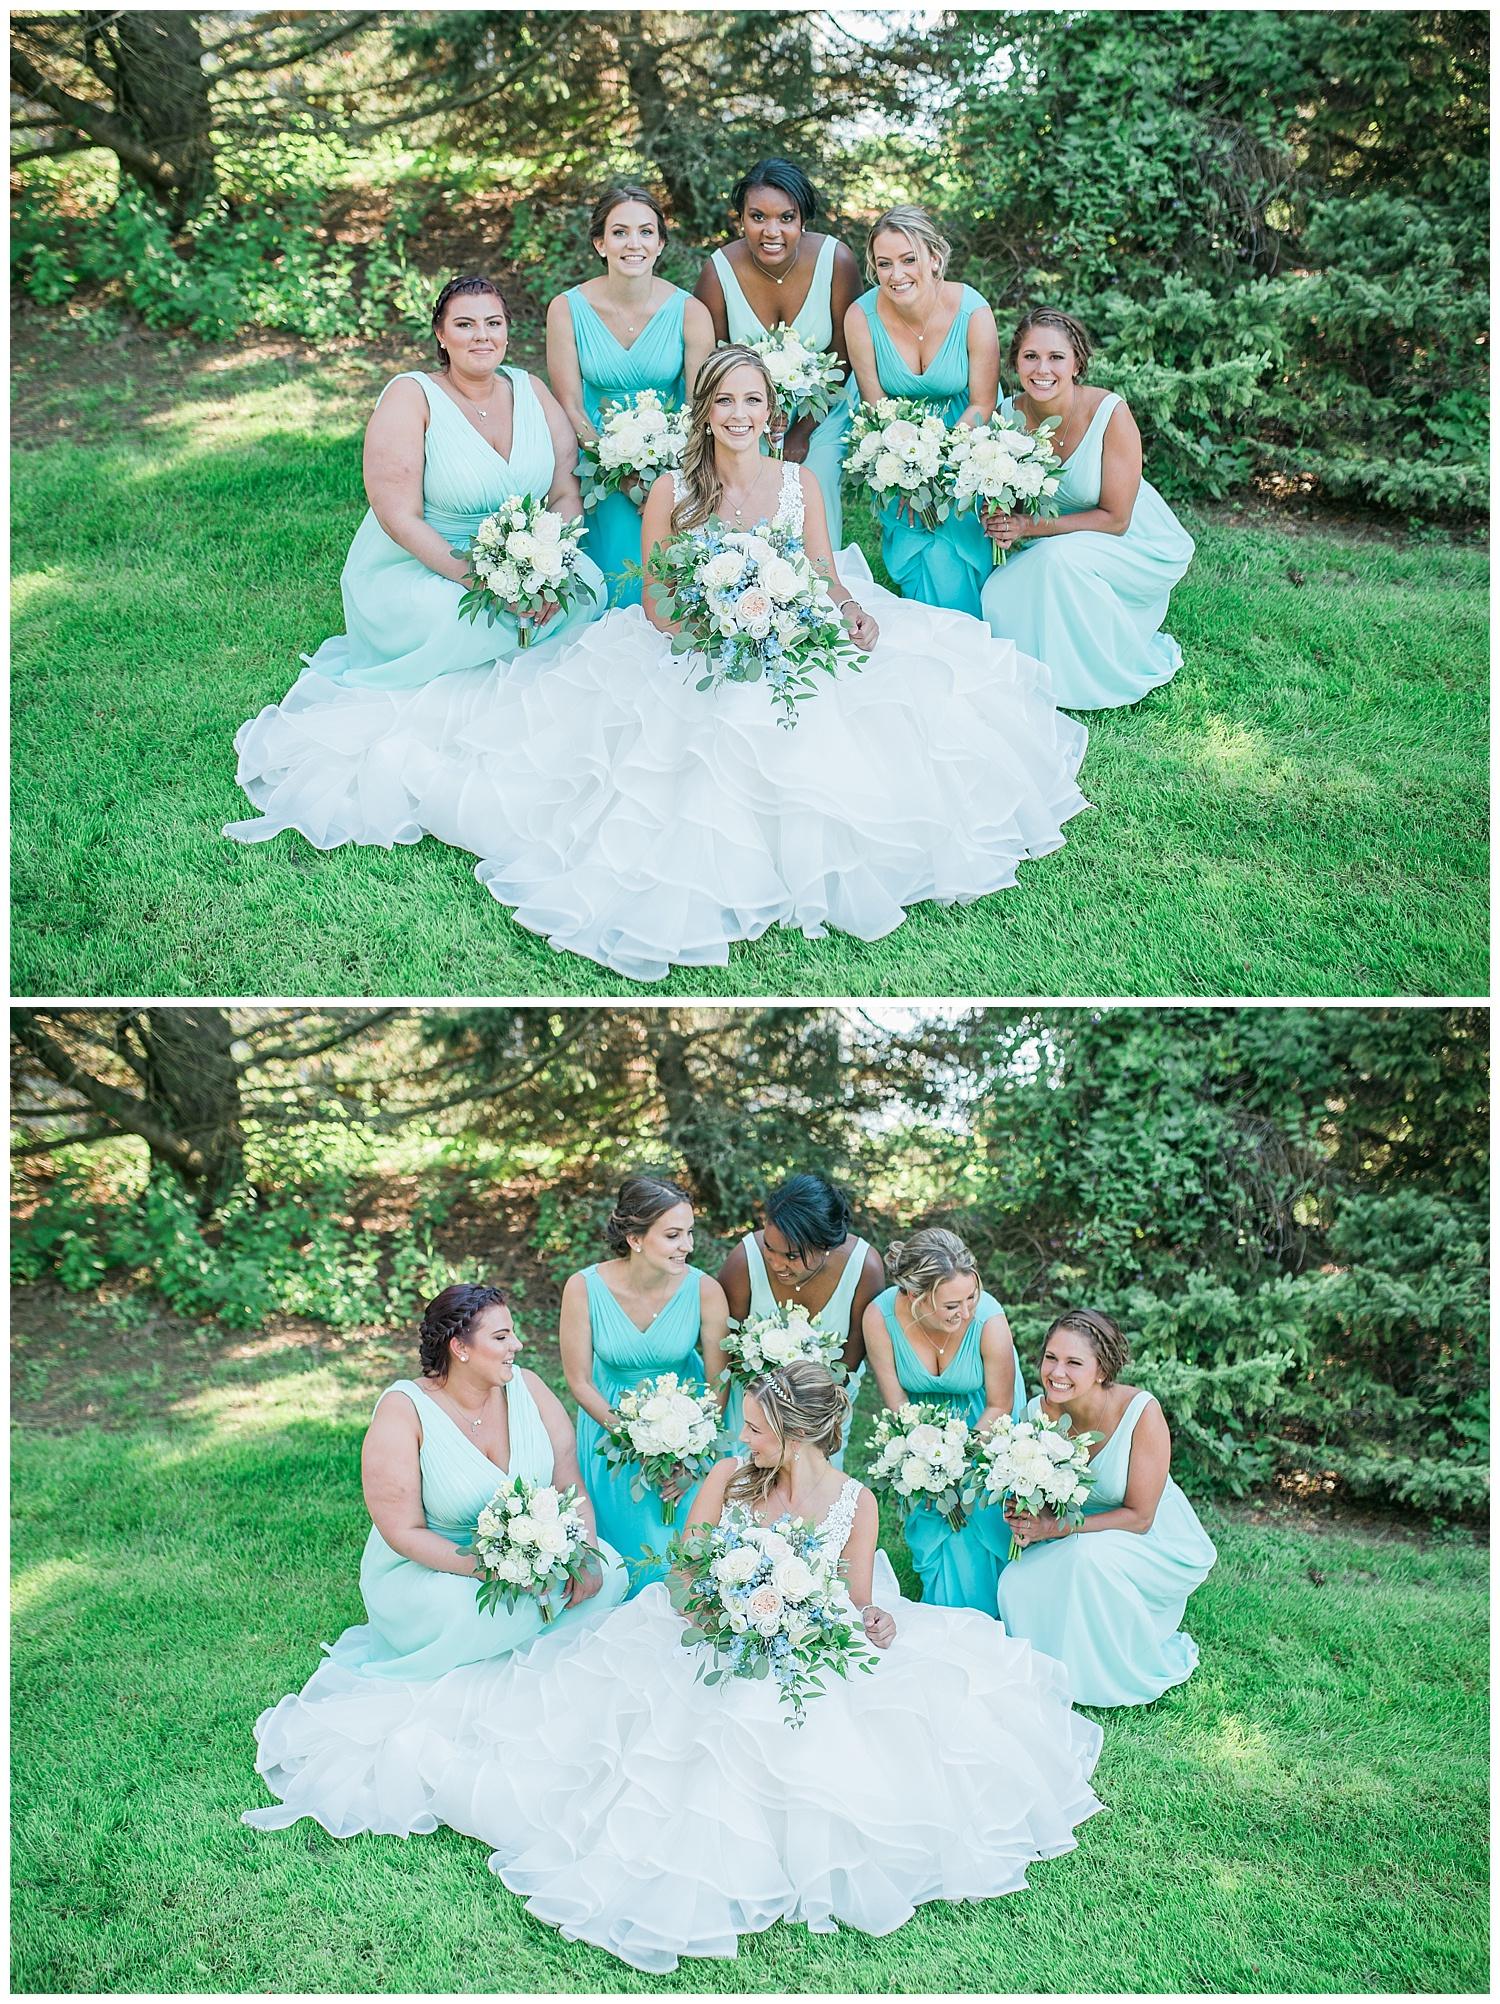 Sean and Andrea - Webster wedding - lass and beau-460_Buffalo wedding photography.jpg